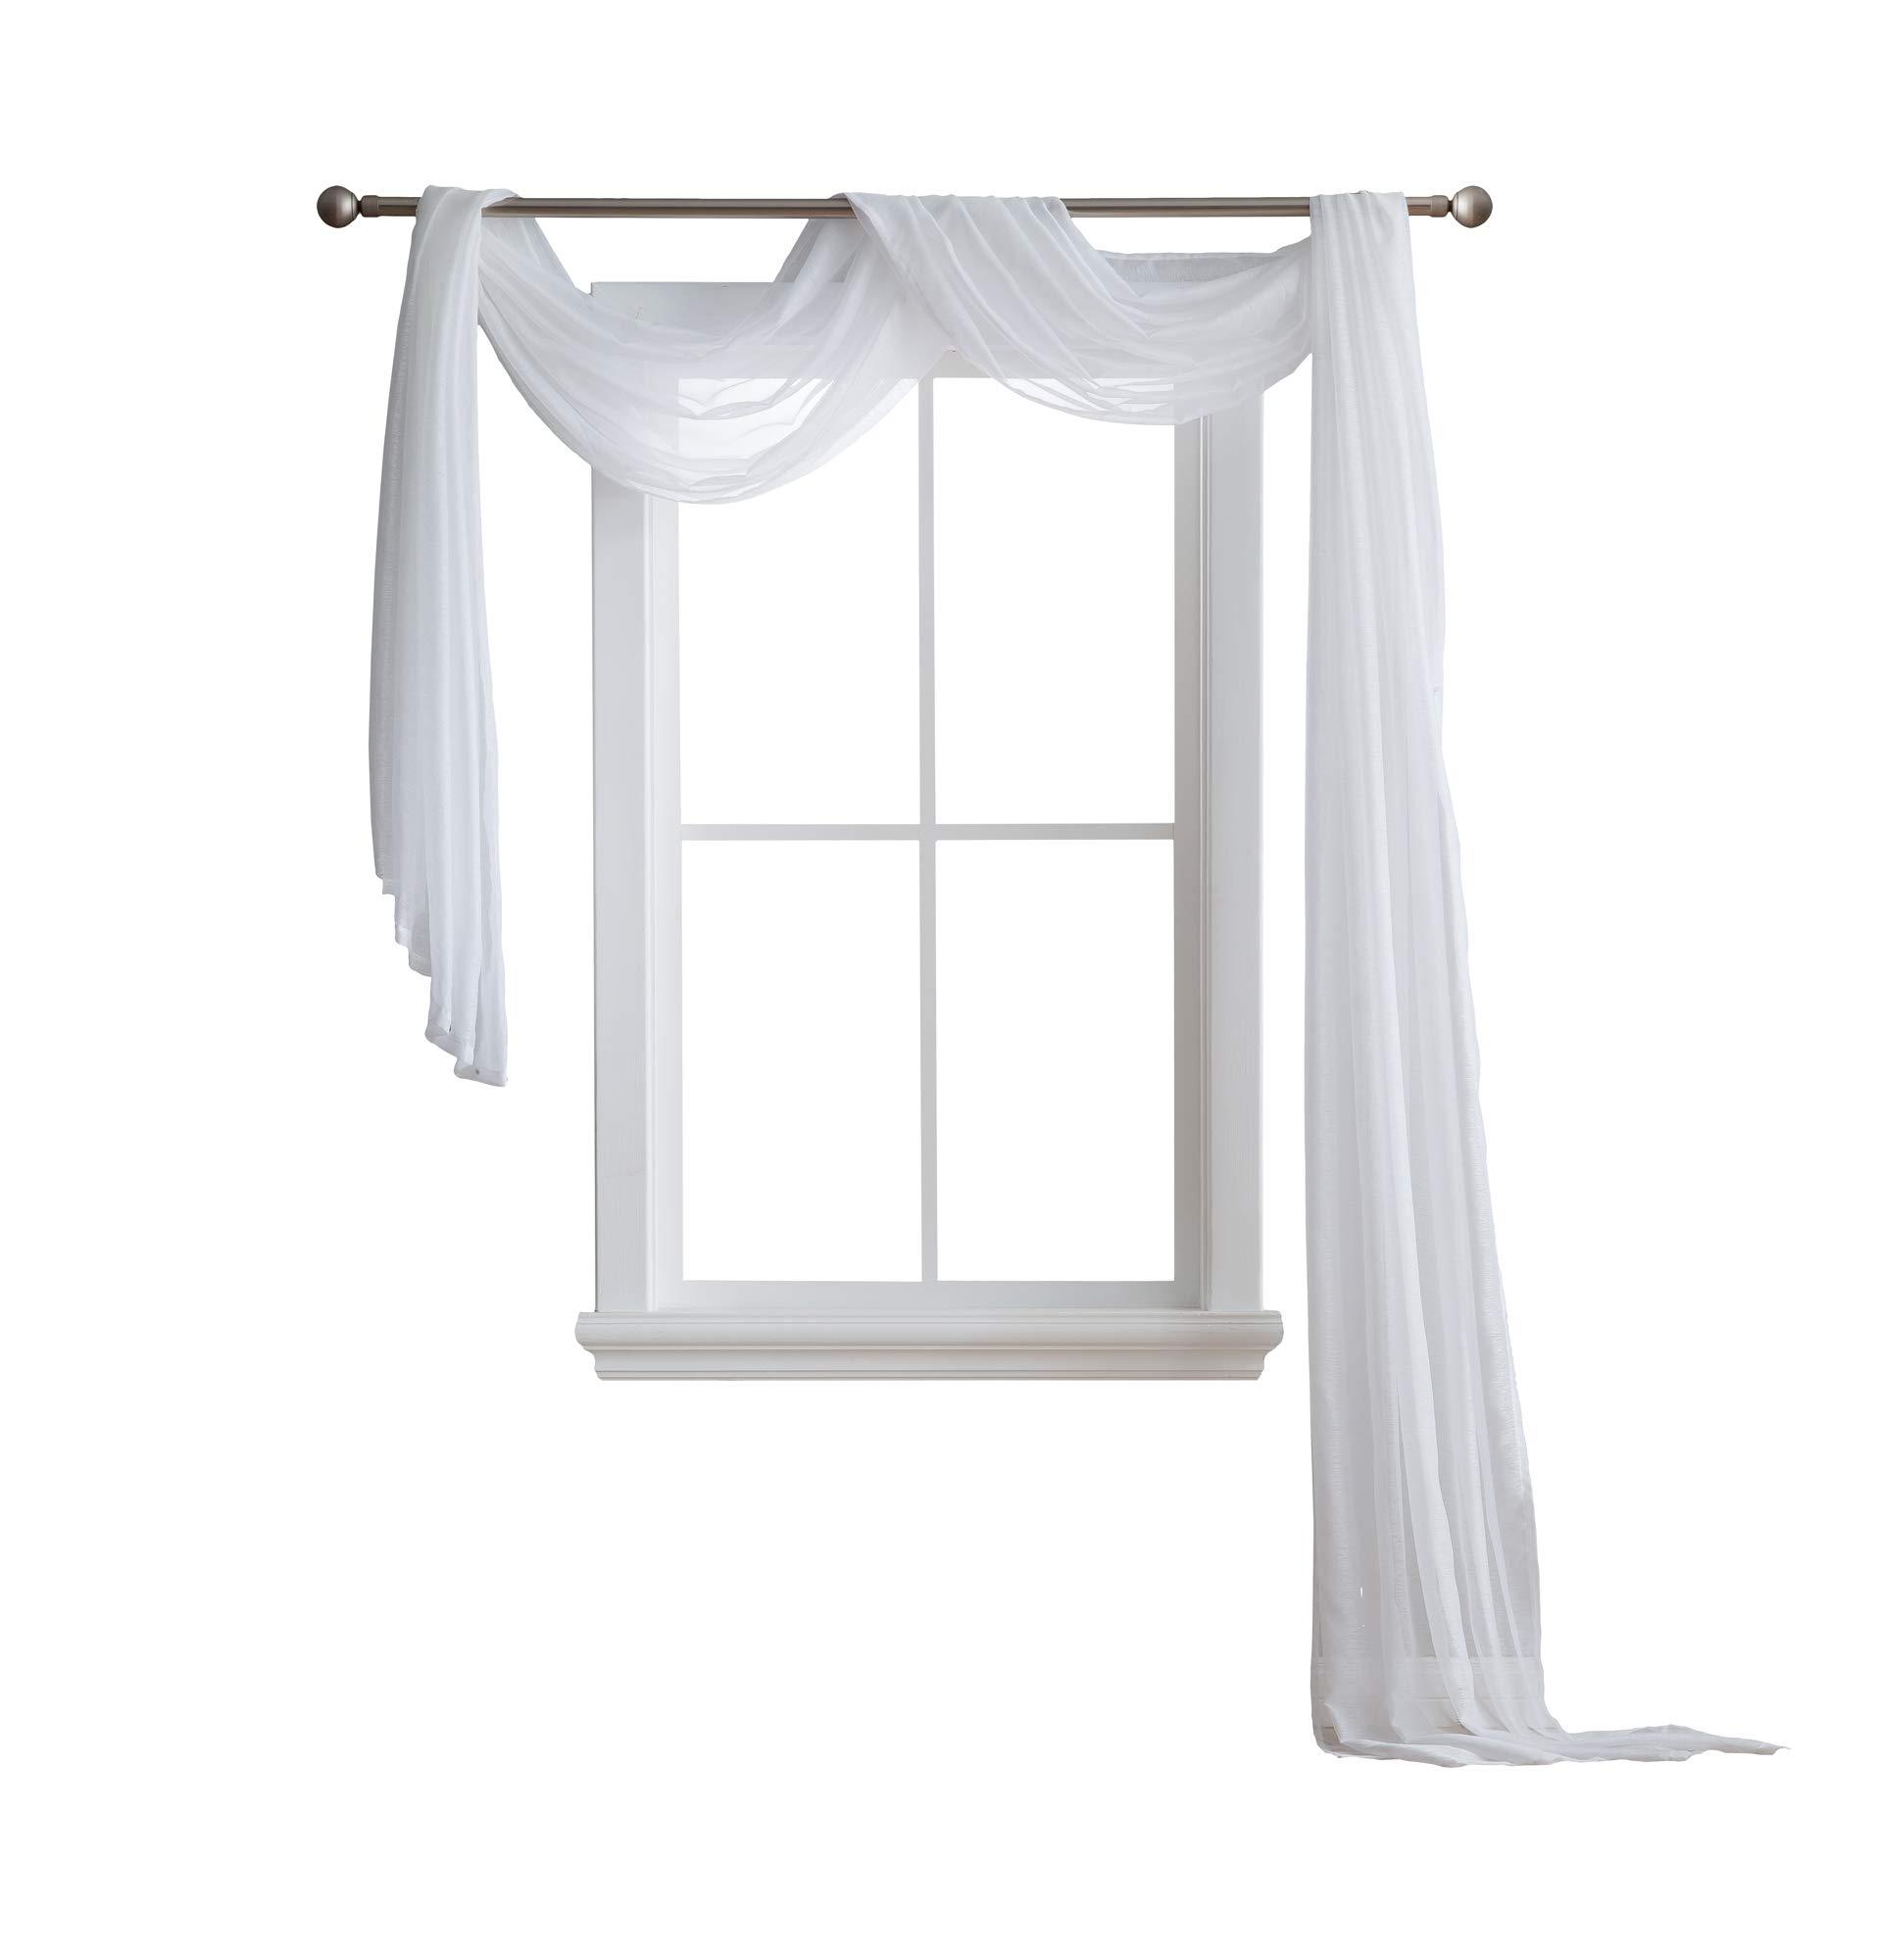 LinenZone Karina - Semi-Sheer Window Scarf (54 x 216) - Elegant Home Decor Window Treatments - Add to Window Curtains for Enhanced Effect (1 Scarf 54'' x 216'', White)